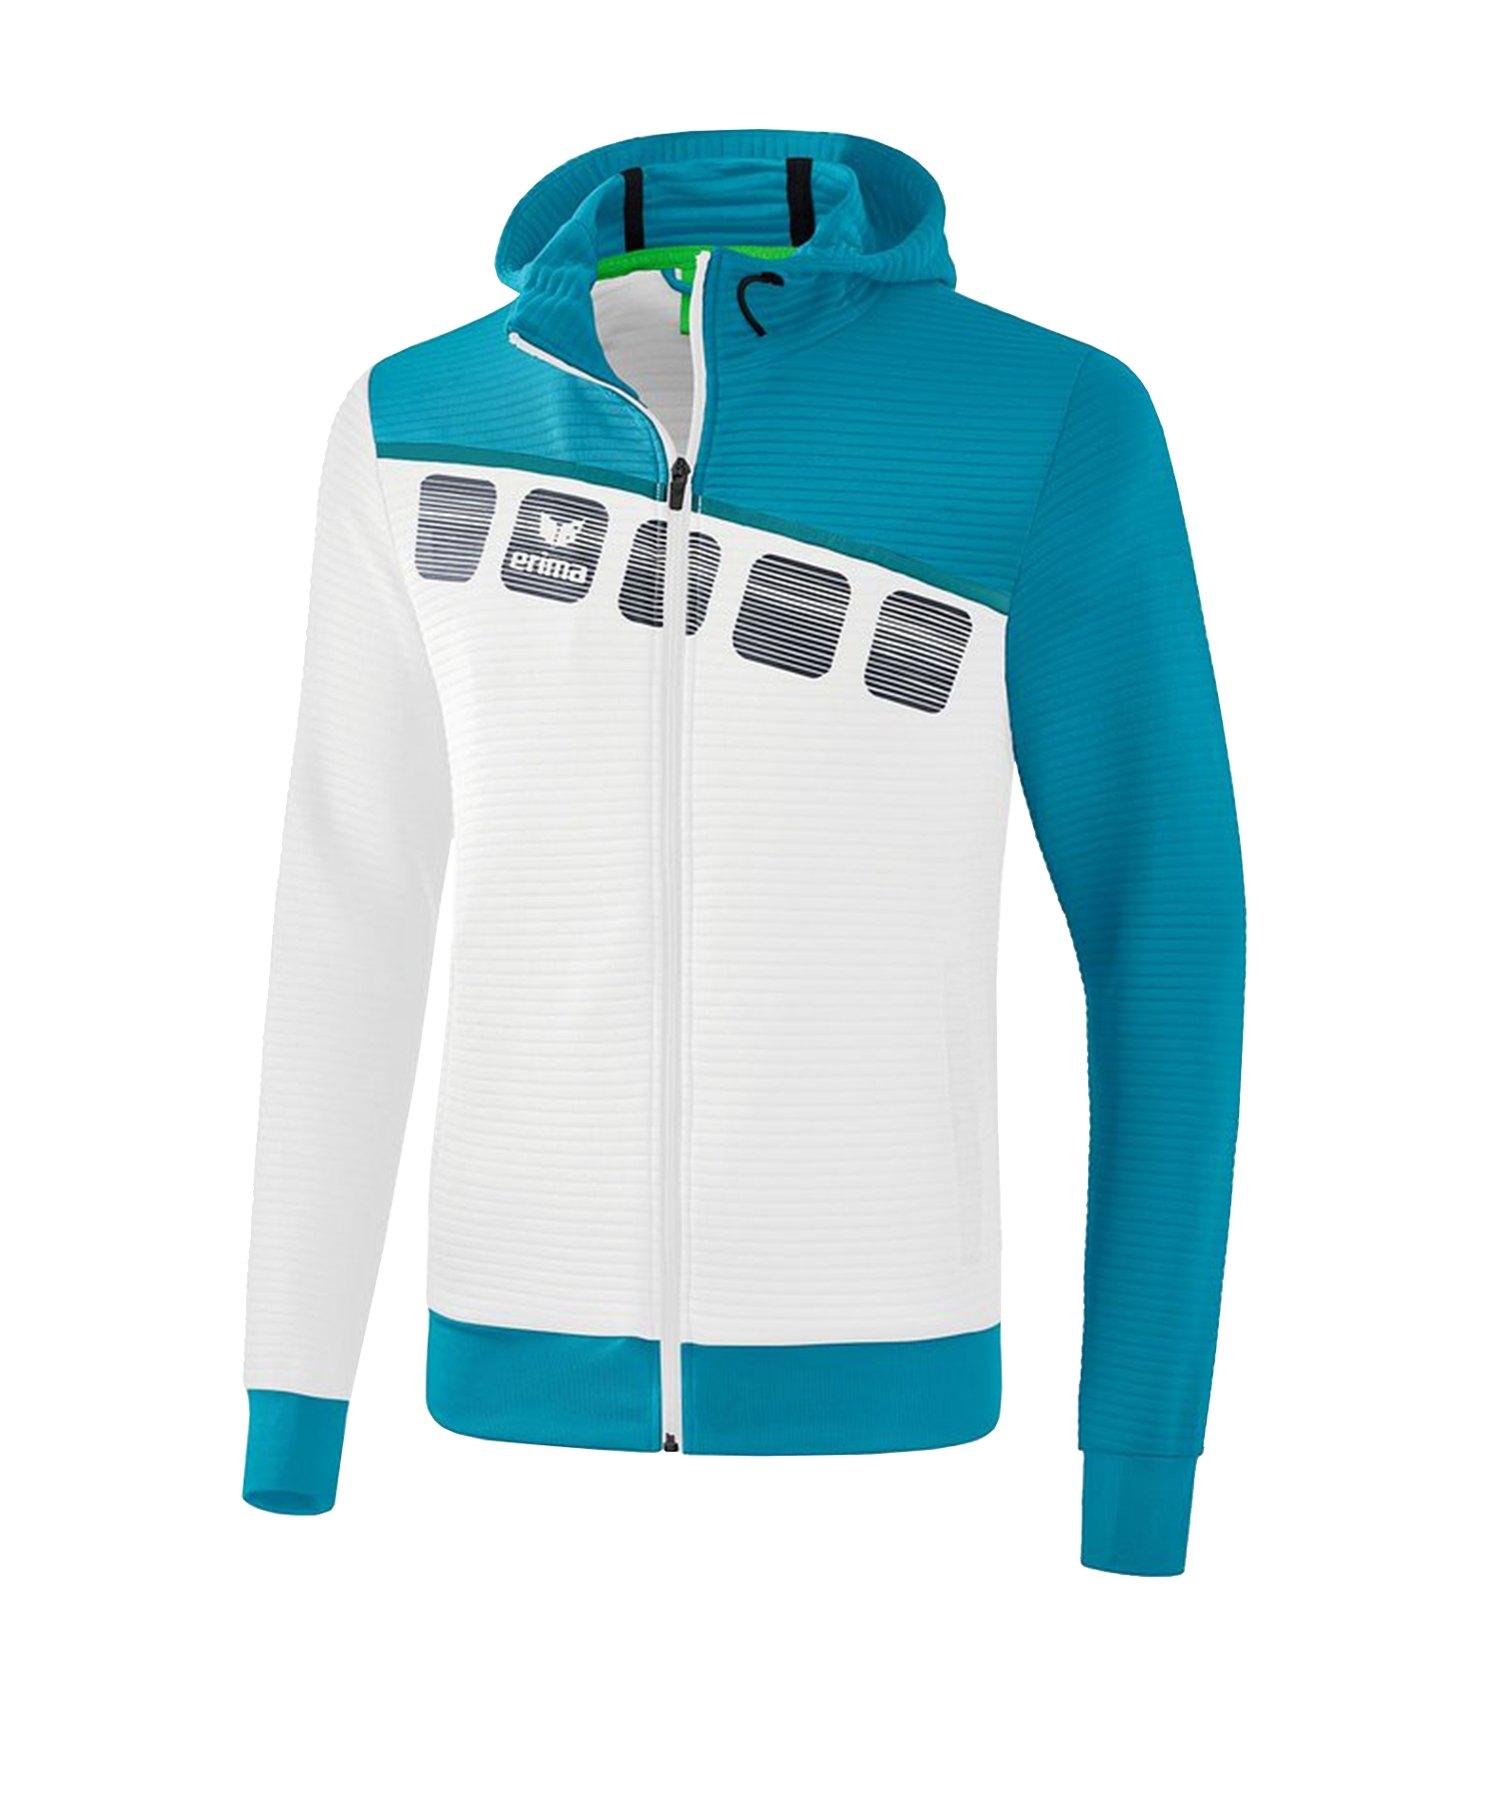 Erima 5-C Trainingsjacke mit Kapuze Weiss Blau - Weiss